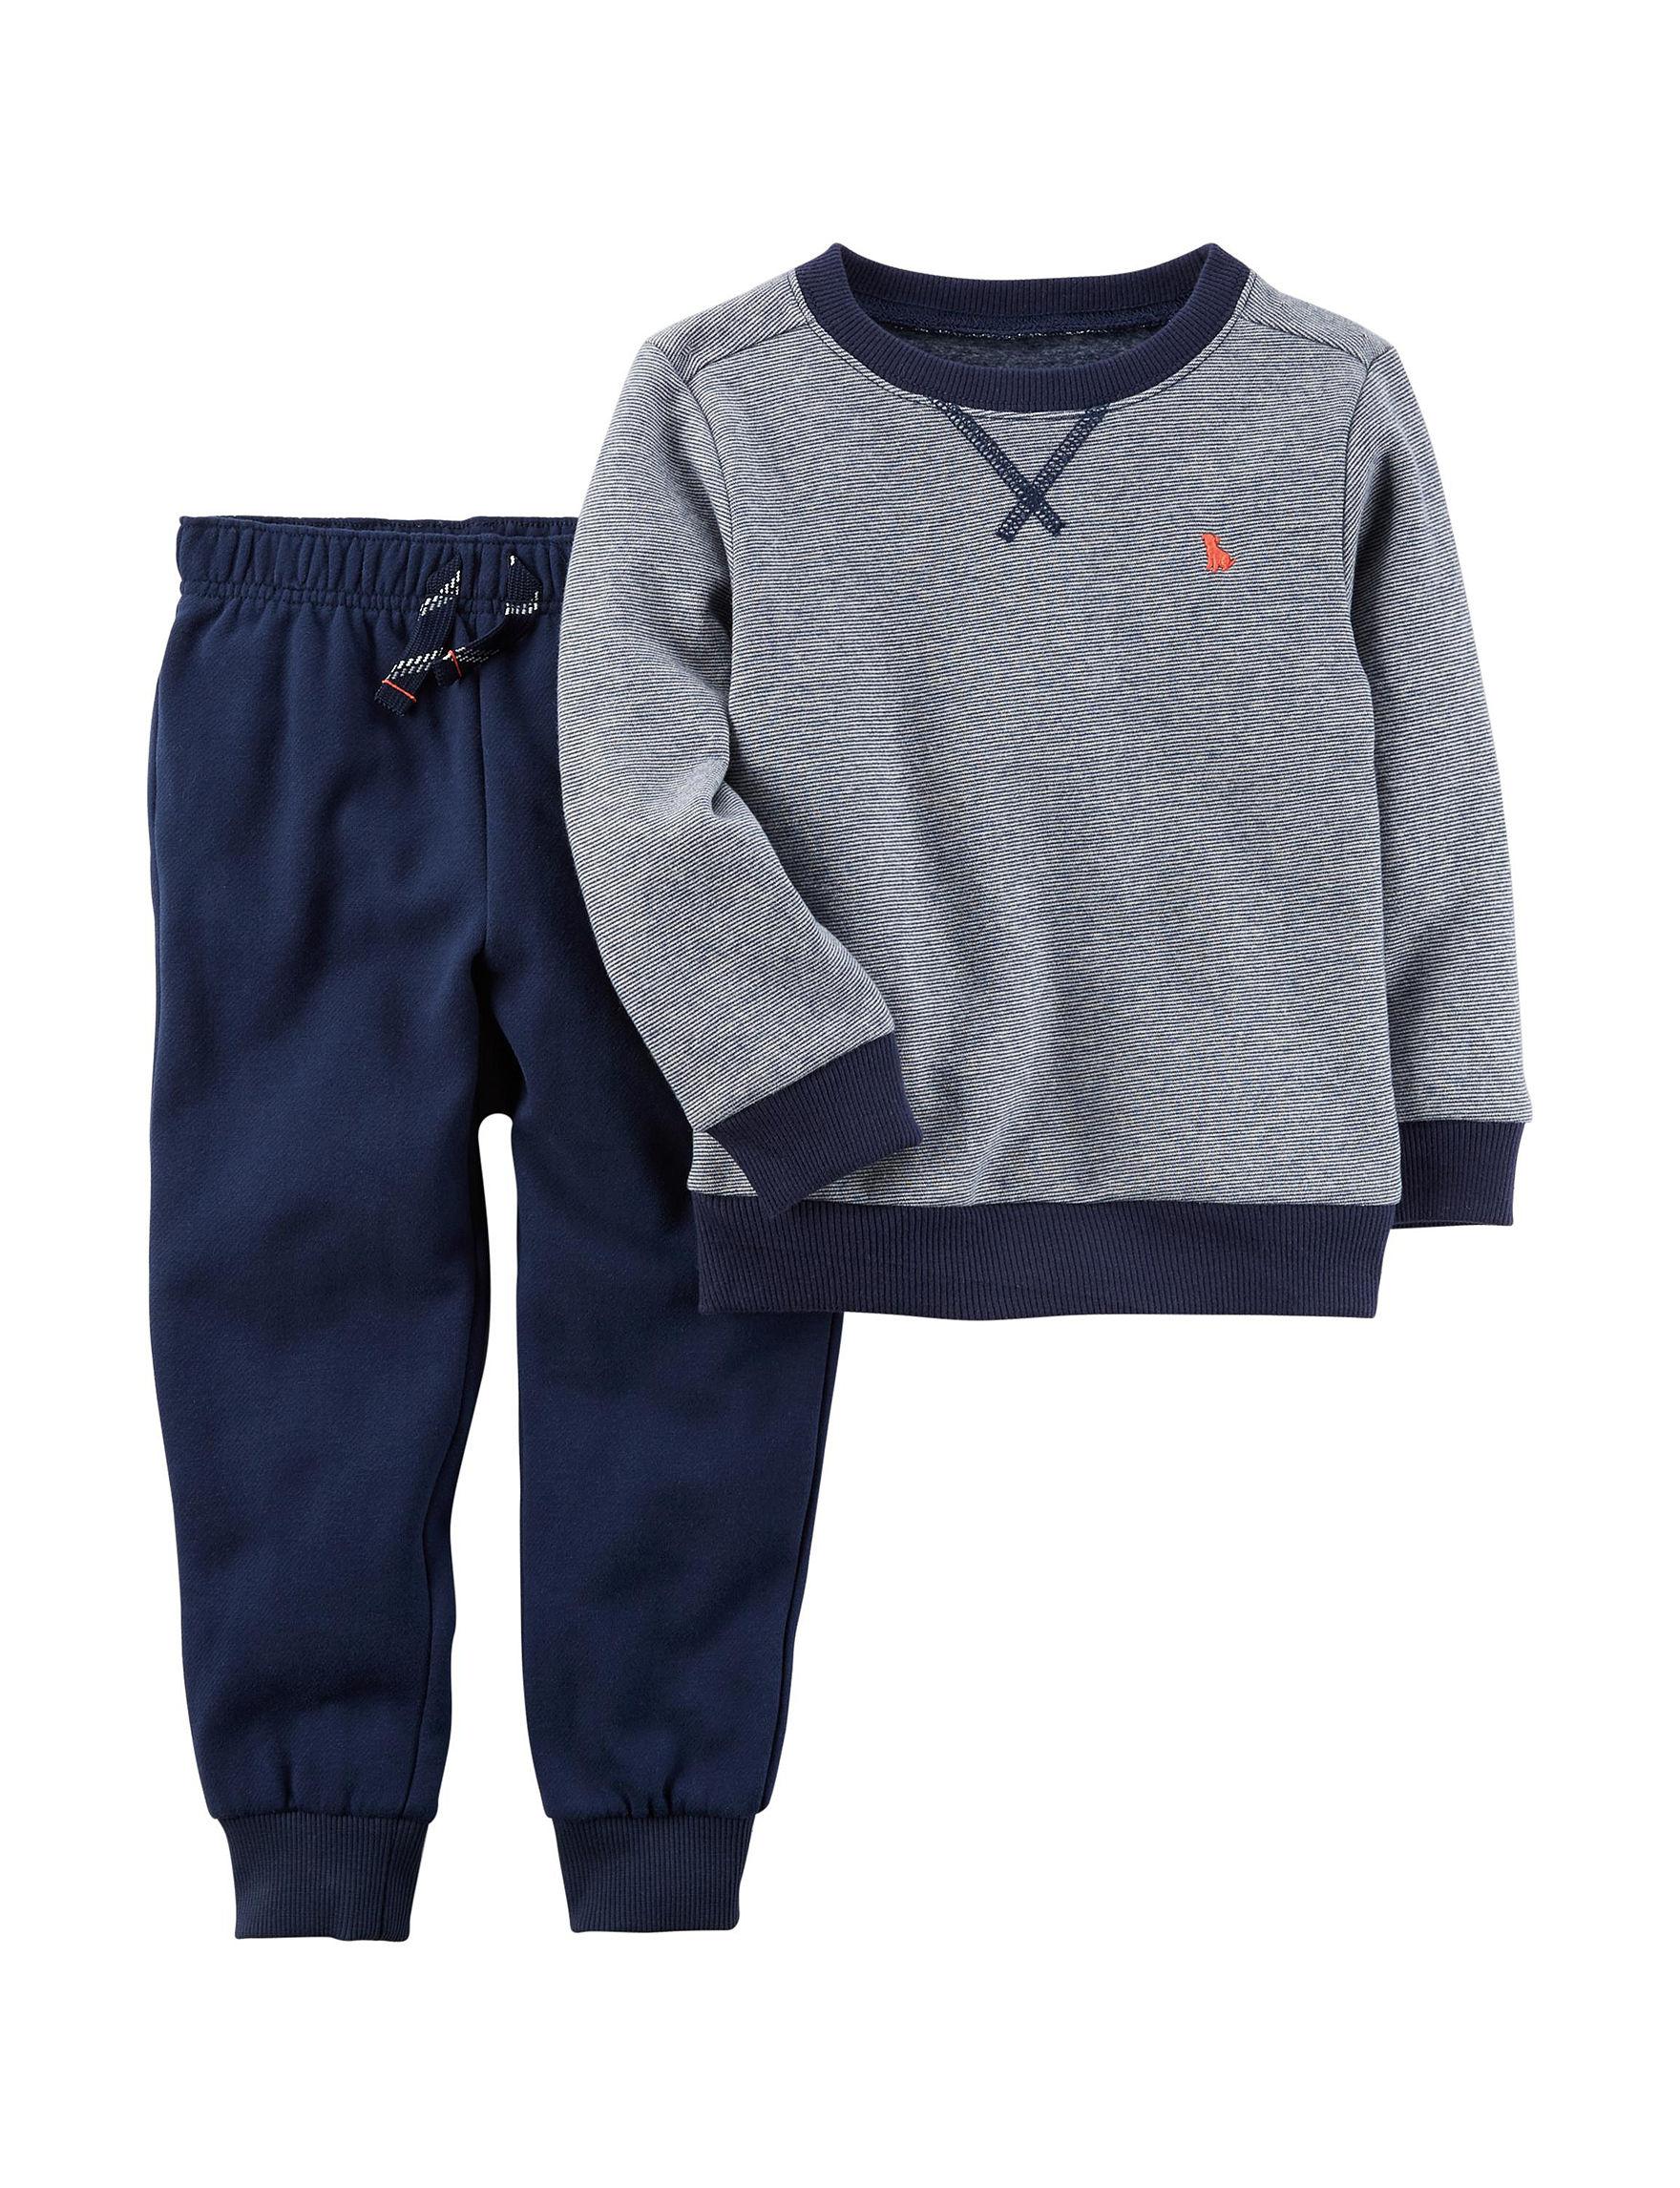 Carter's Blue Soft Pants